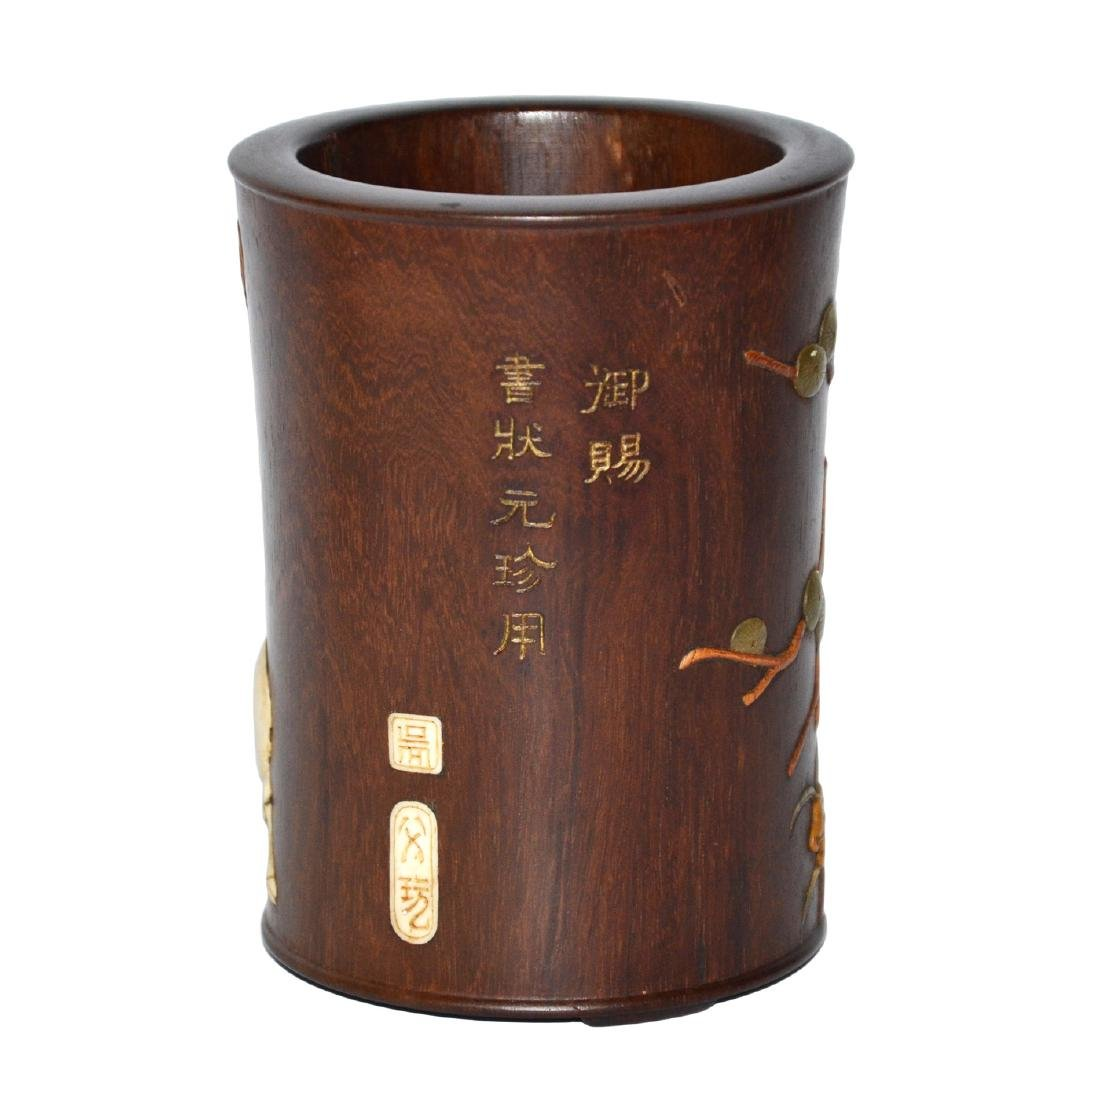 Huanghuali Brush Pot Embellished with Deer and Lingzhi - 3